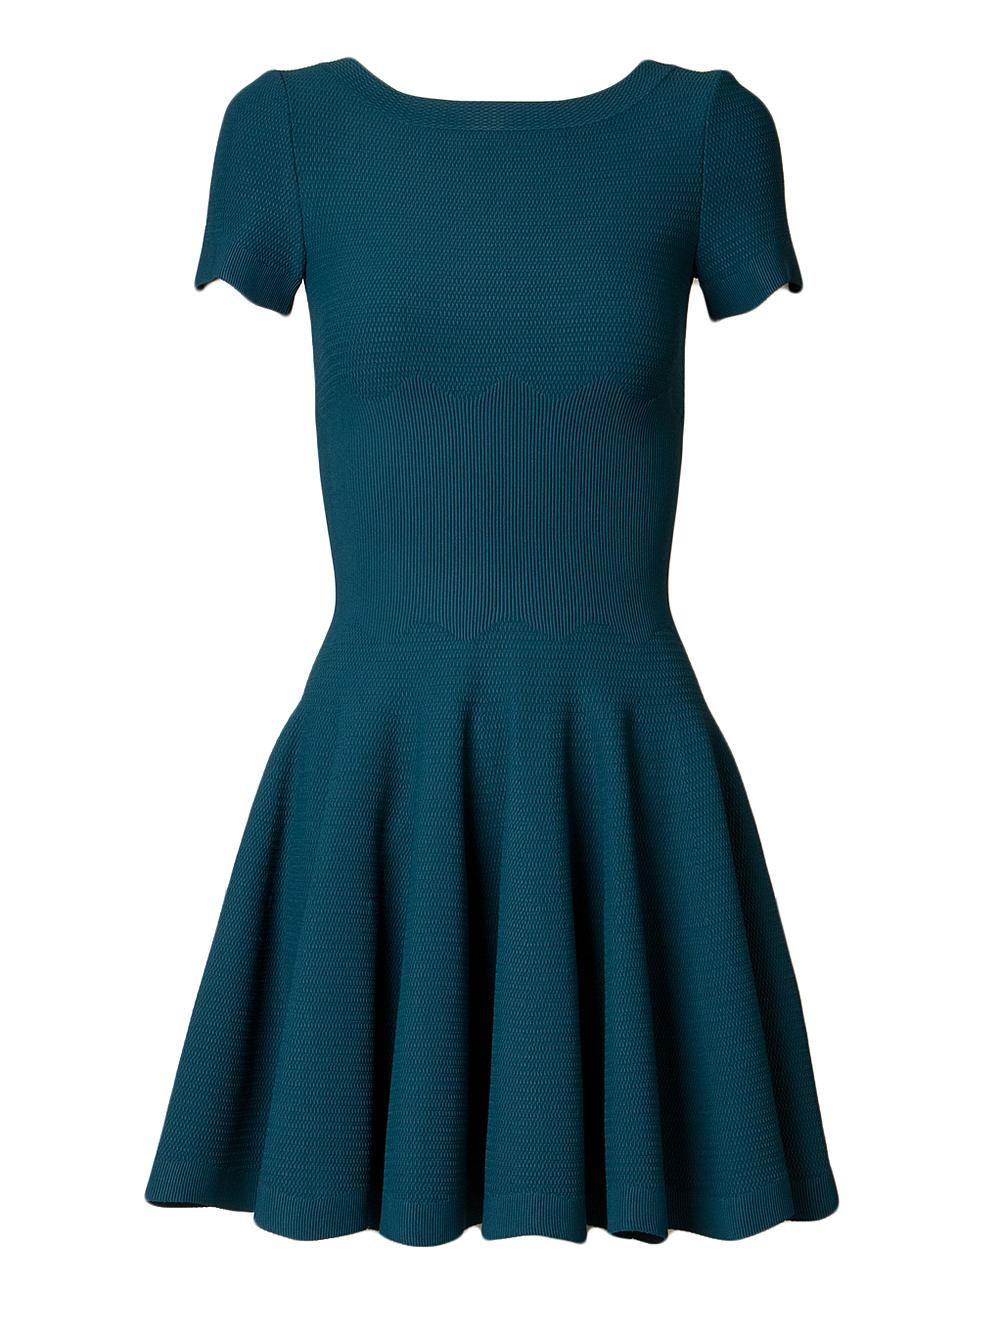 Alaia Azzedine Dresses >> Alaïa Knit Dress in Blue | Lyst